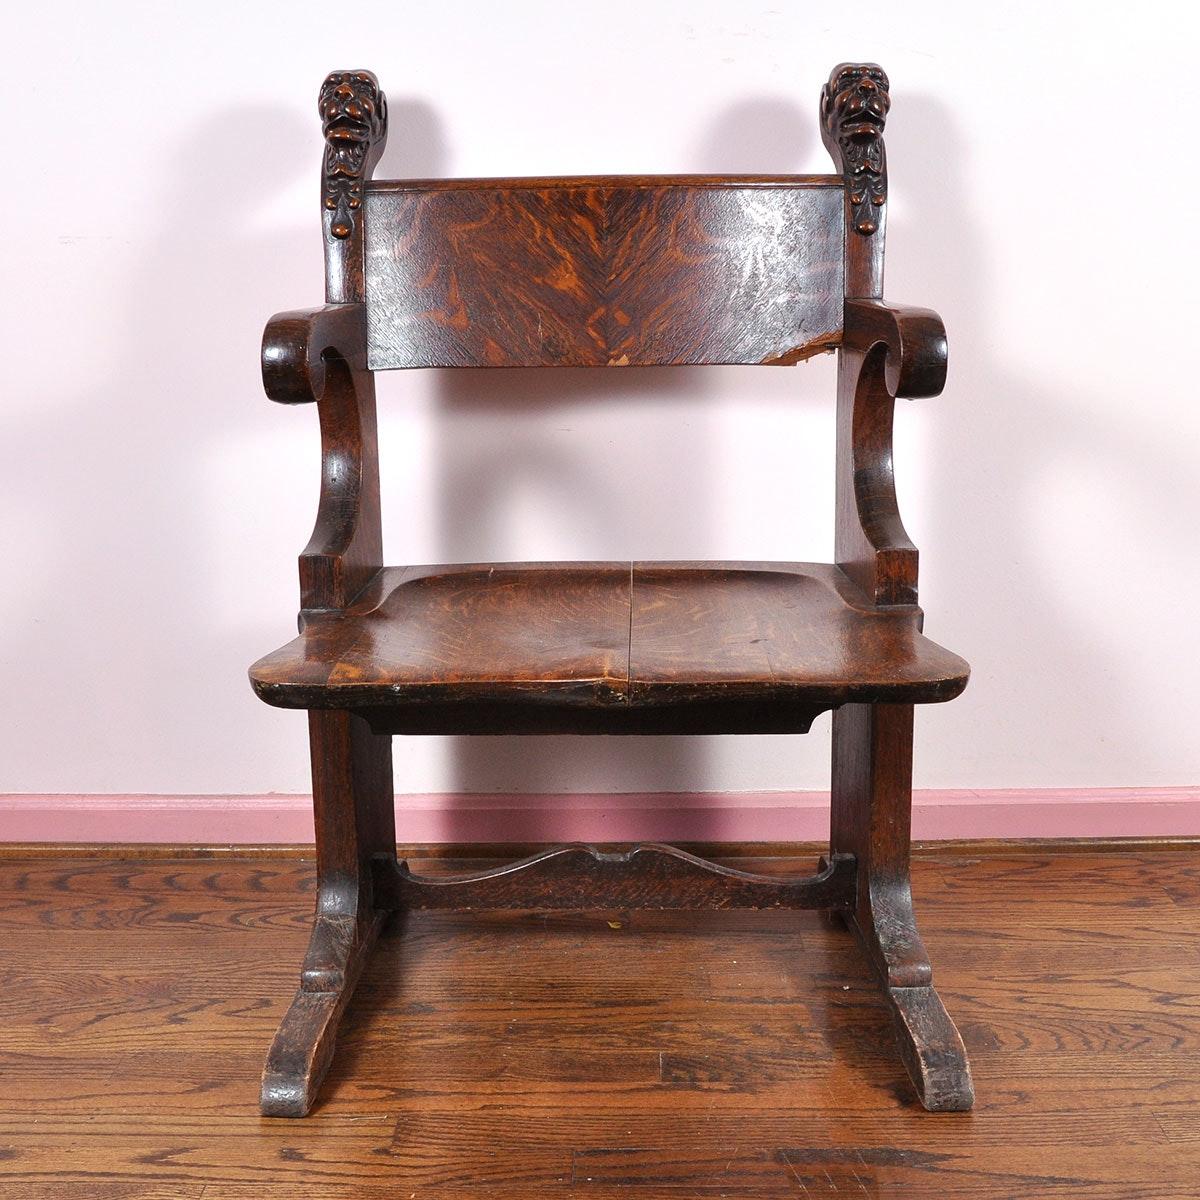 Stomps-Burkhardt Oak Gothic Throne Chair ... & Stomps-Burkhardt Oak Gothic Throne Chair : EBTH